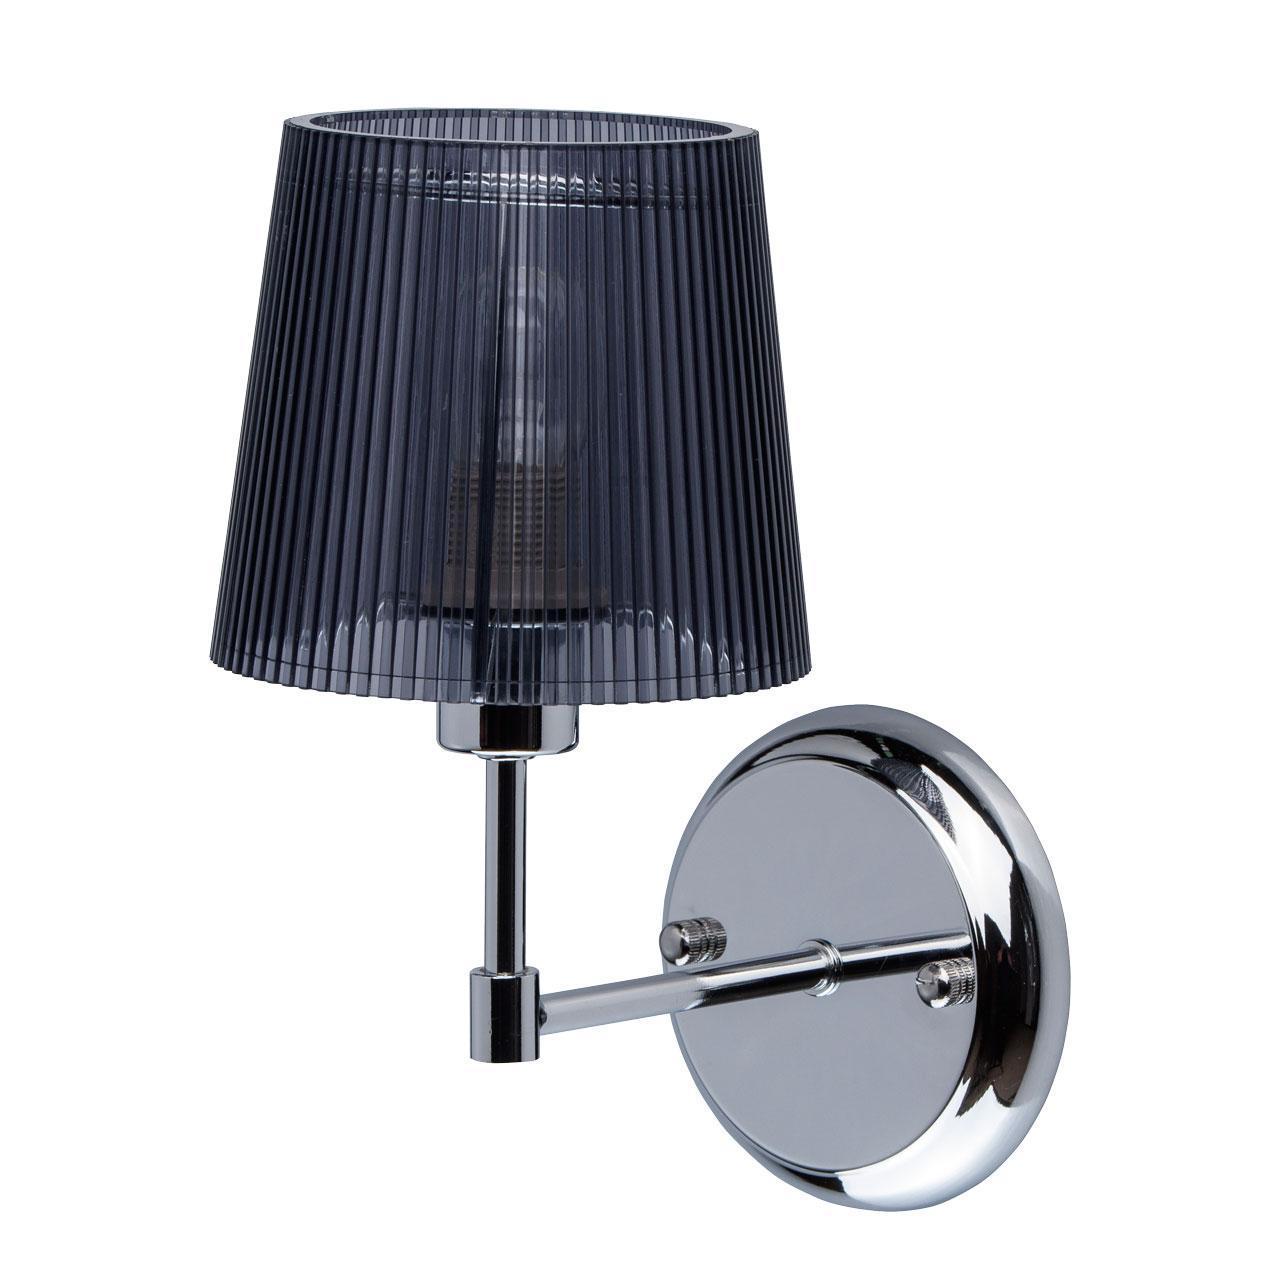 Бра MW-Light Лацио 2 103020401 цены